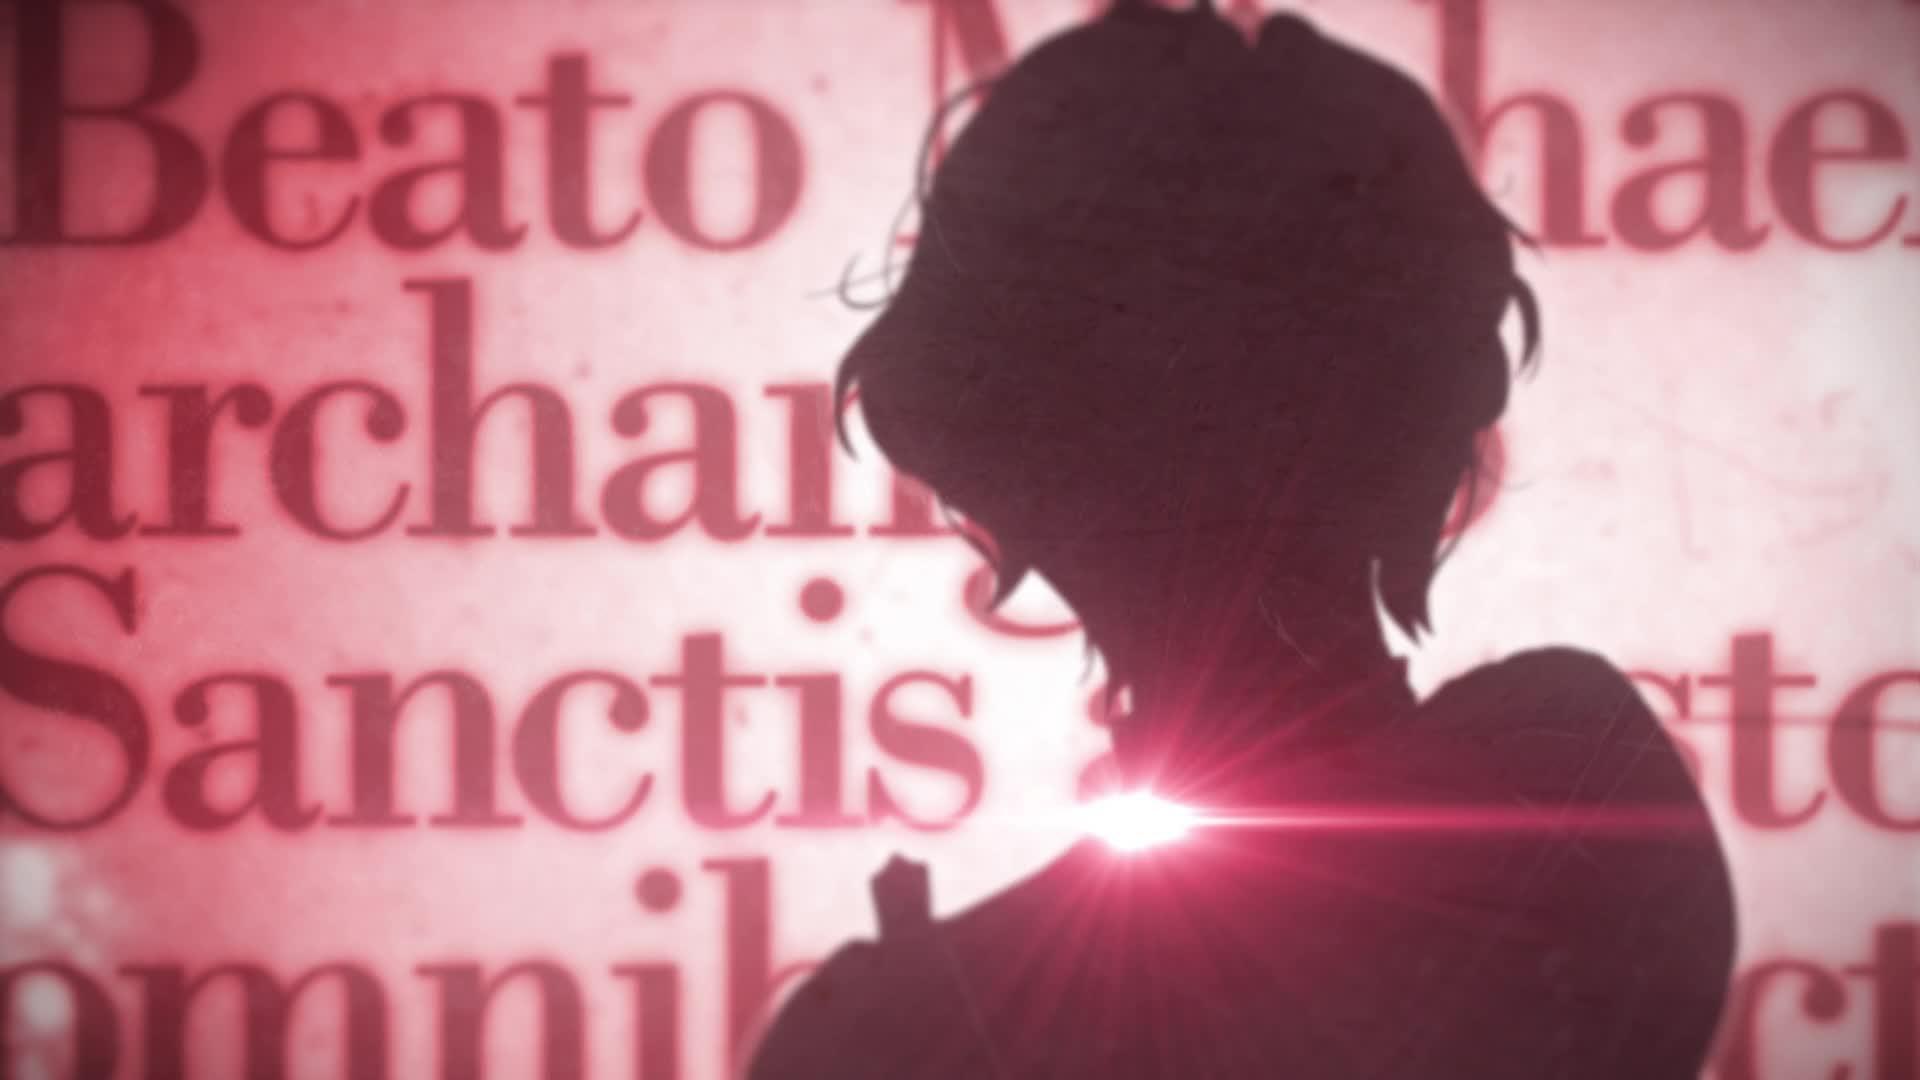 DESTINY CHILD: DC TUBE - [PV] Ragna Break Season 13 - Kyrie Eleison video cover image 0